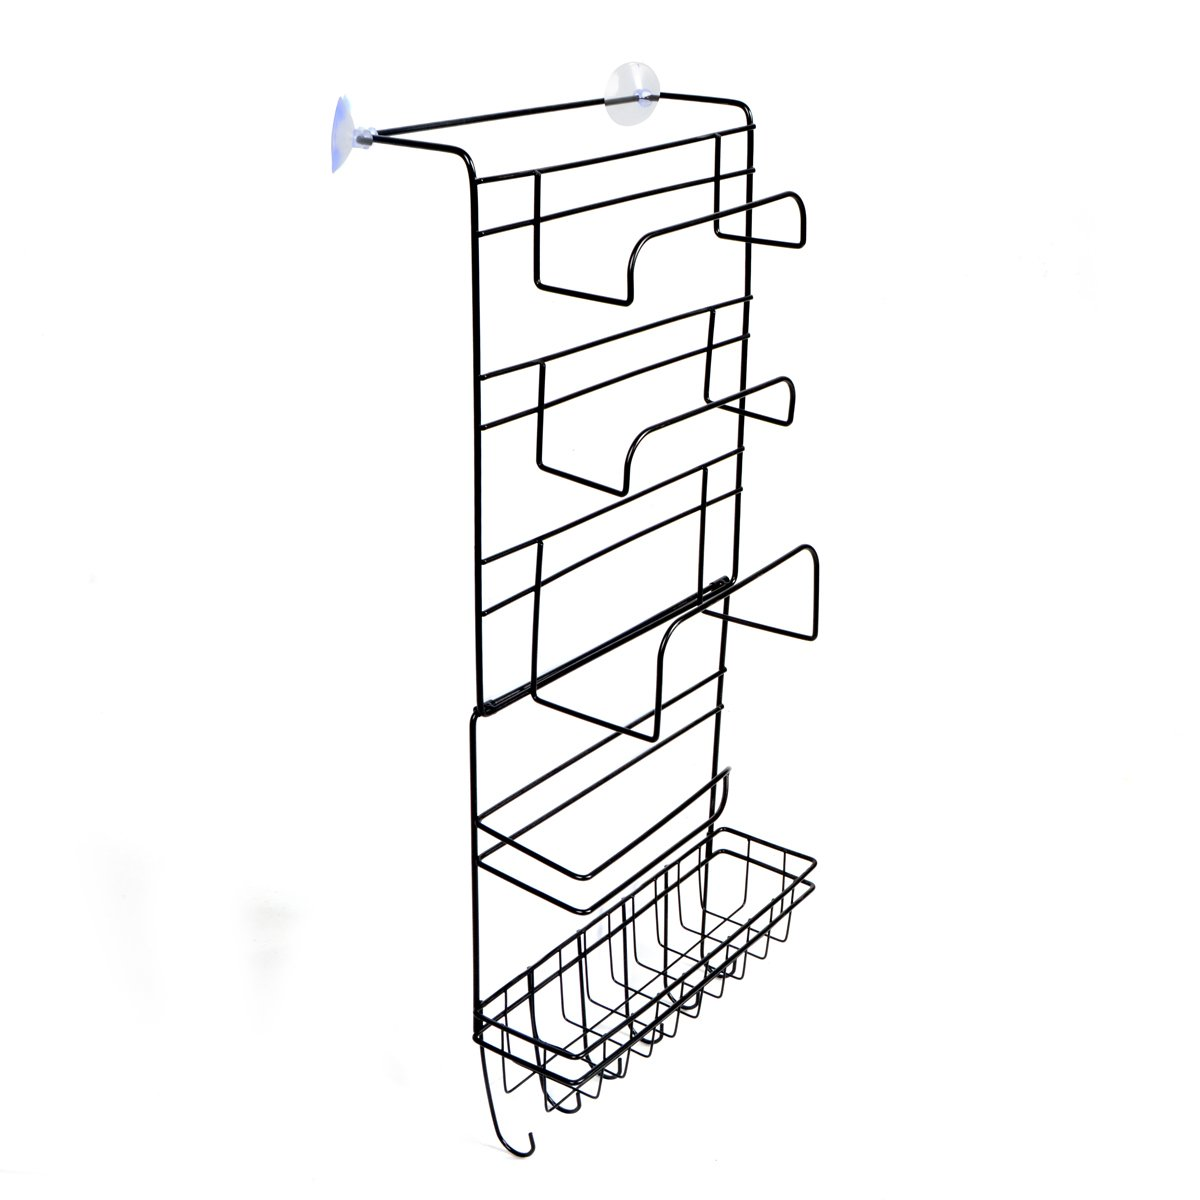 Saim Kitchen Storage Organizer Metal Basket for Aluminum Foil, Sandwich Bags, Cleaning Supplies 5-Tier(Black)